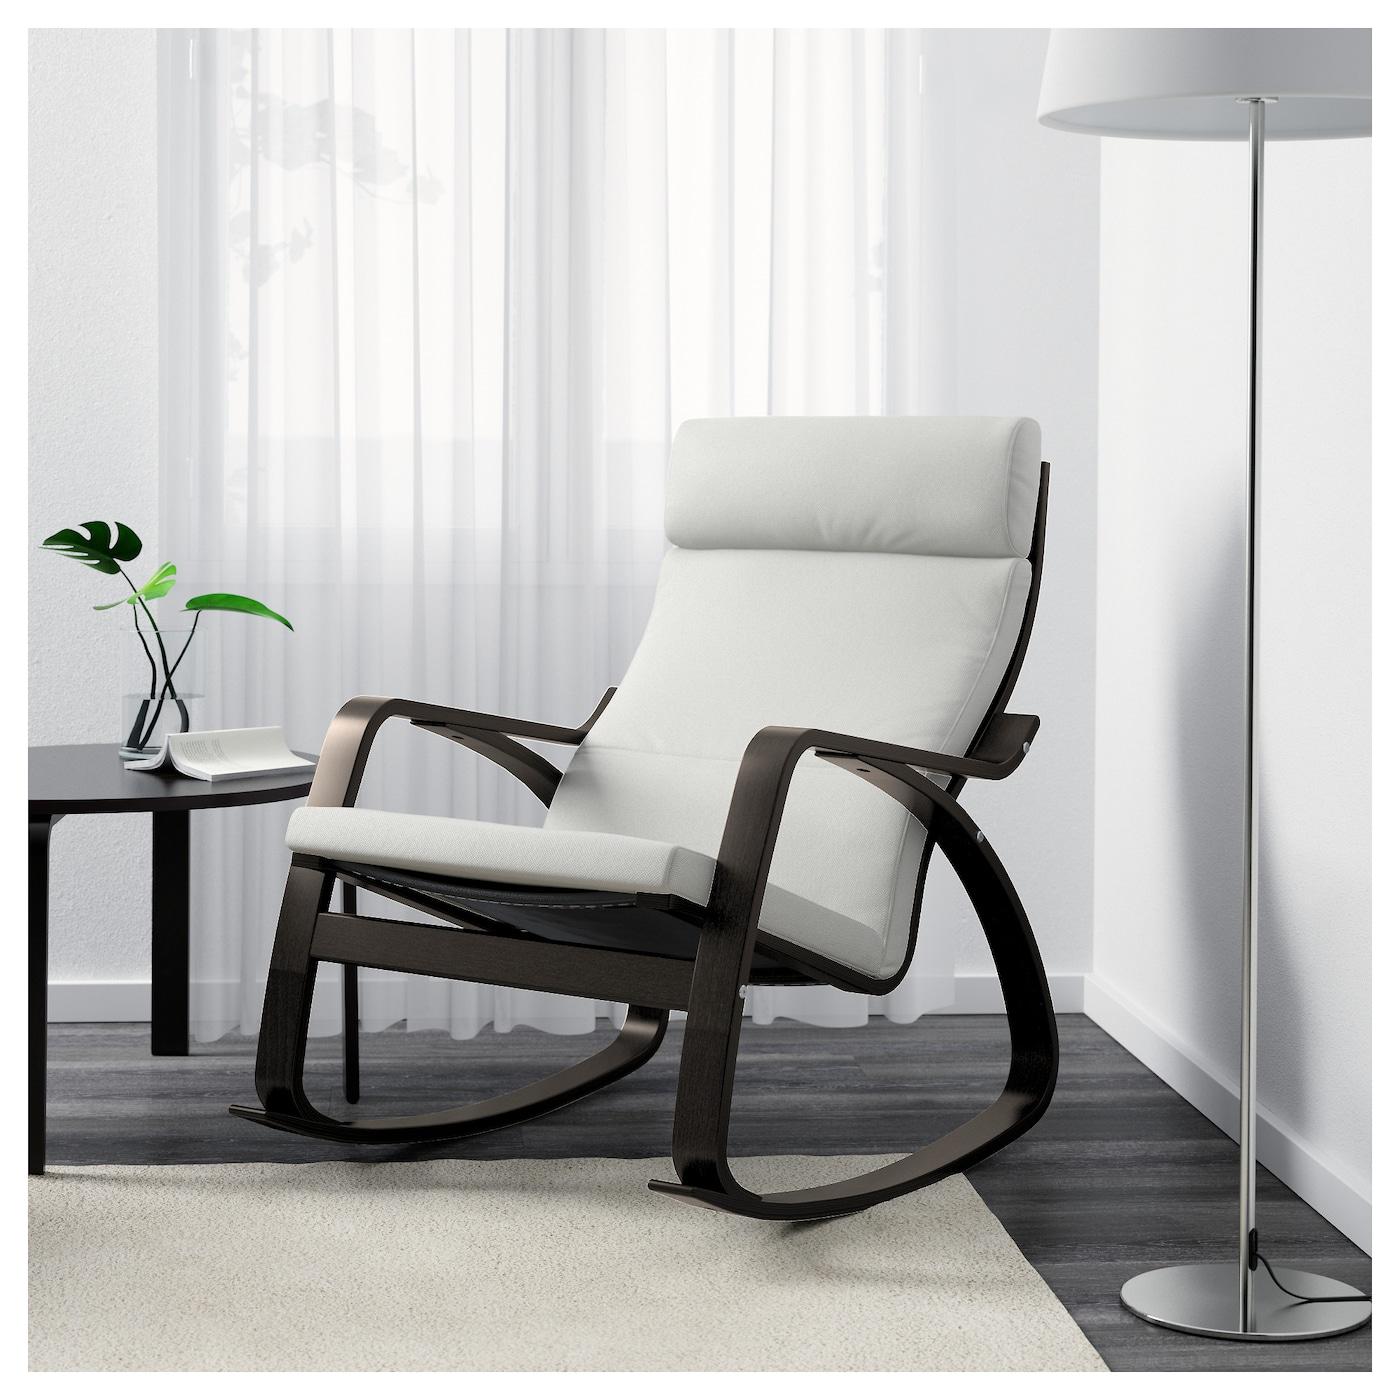 po ng rocking chair black brown finnsta white ikea. Black Bedroom Furniture Sets. Home Design Ideas